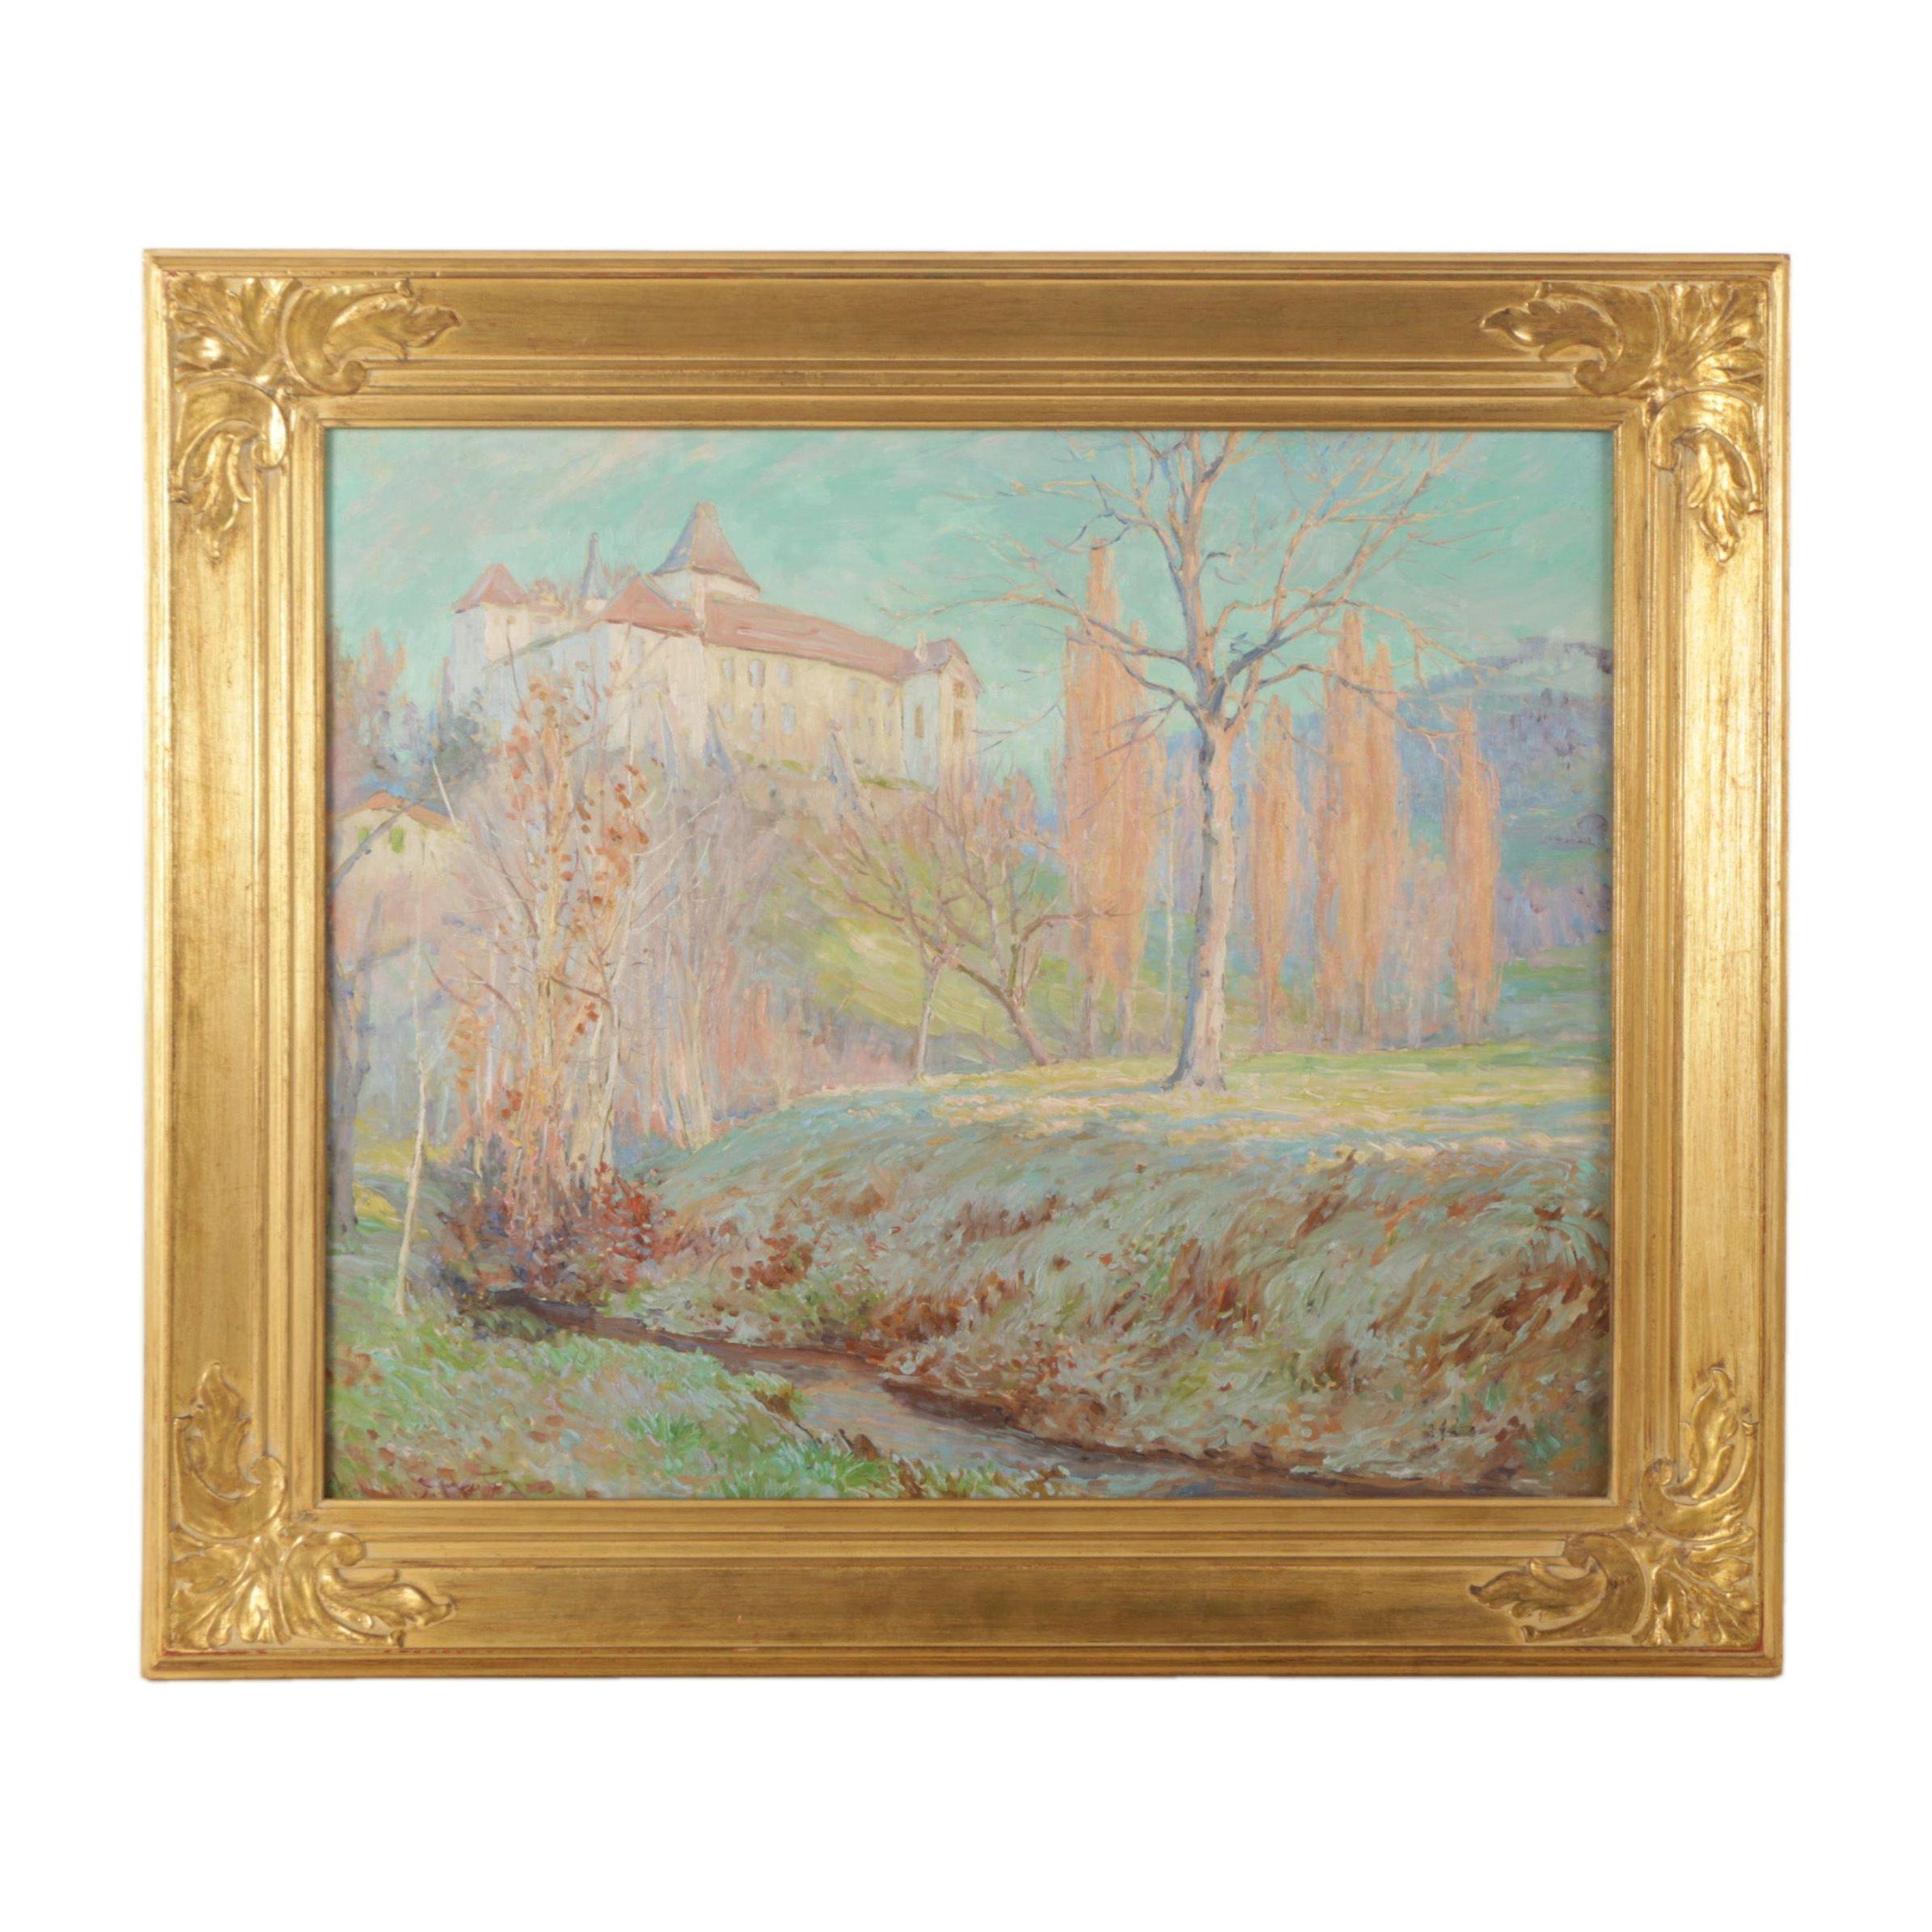 "William Samuel Horton Oil Painting on Board ""Chateau de Blonay"""